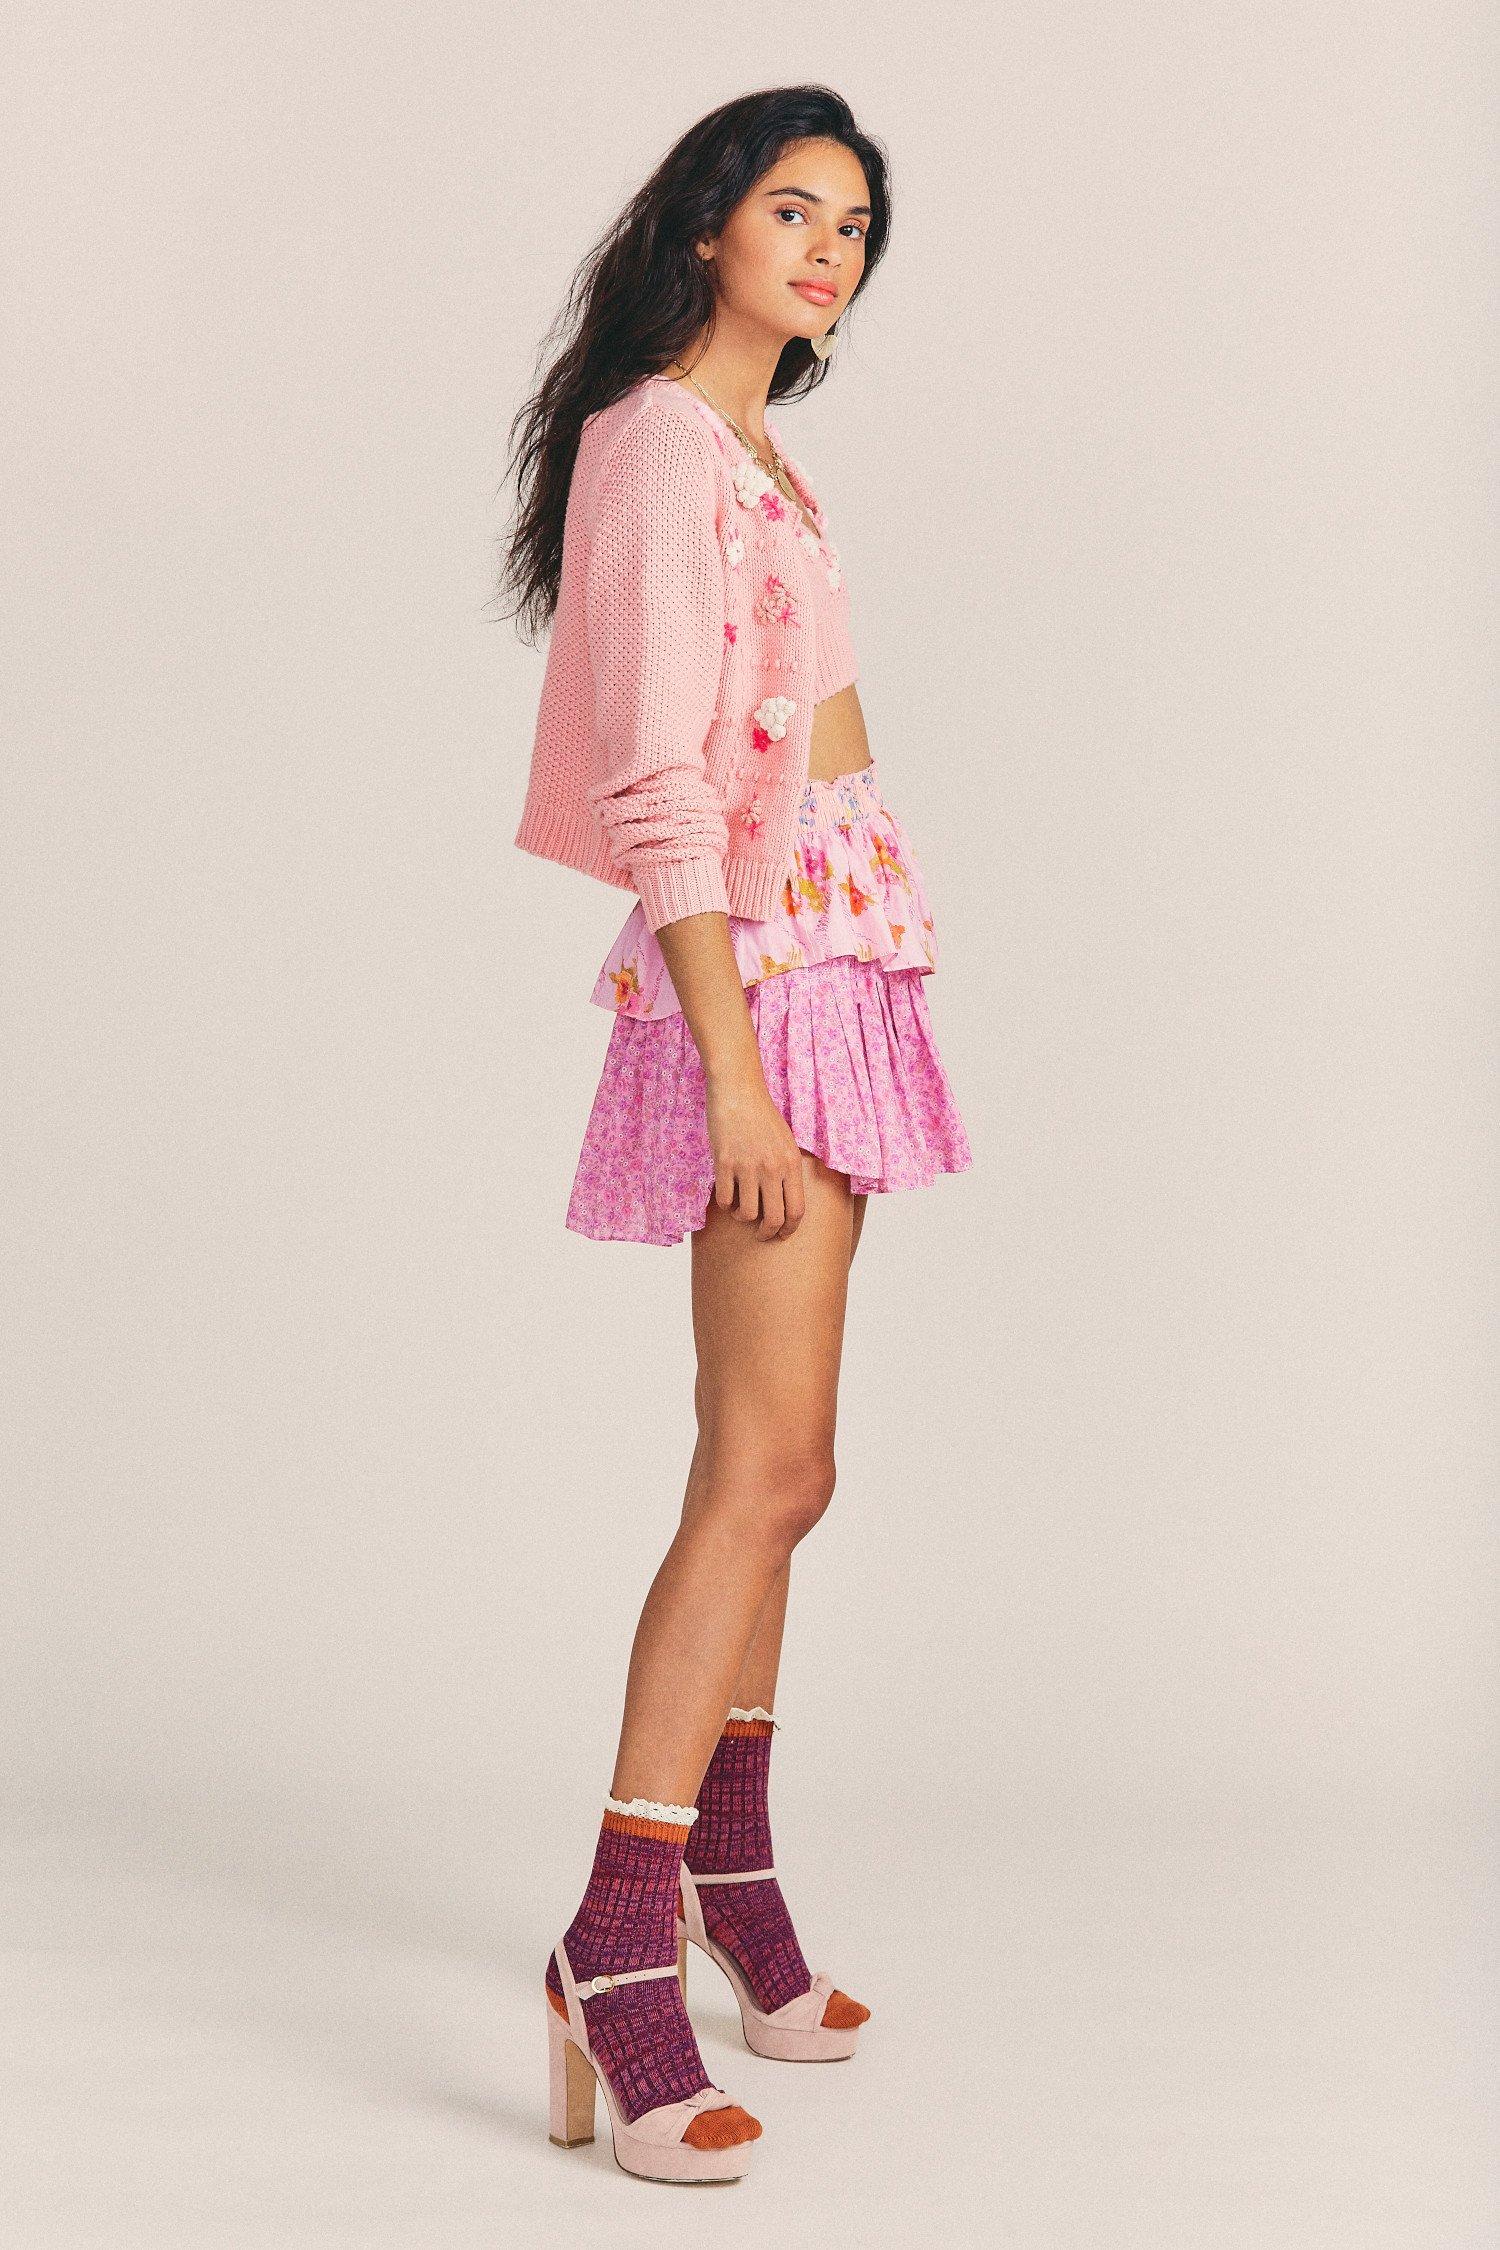 Ruffle-Mini-Skirt-Exploded-Pink-3